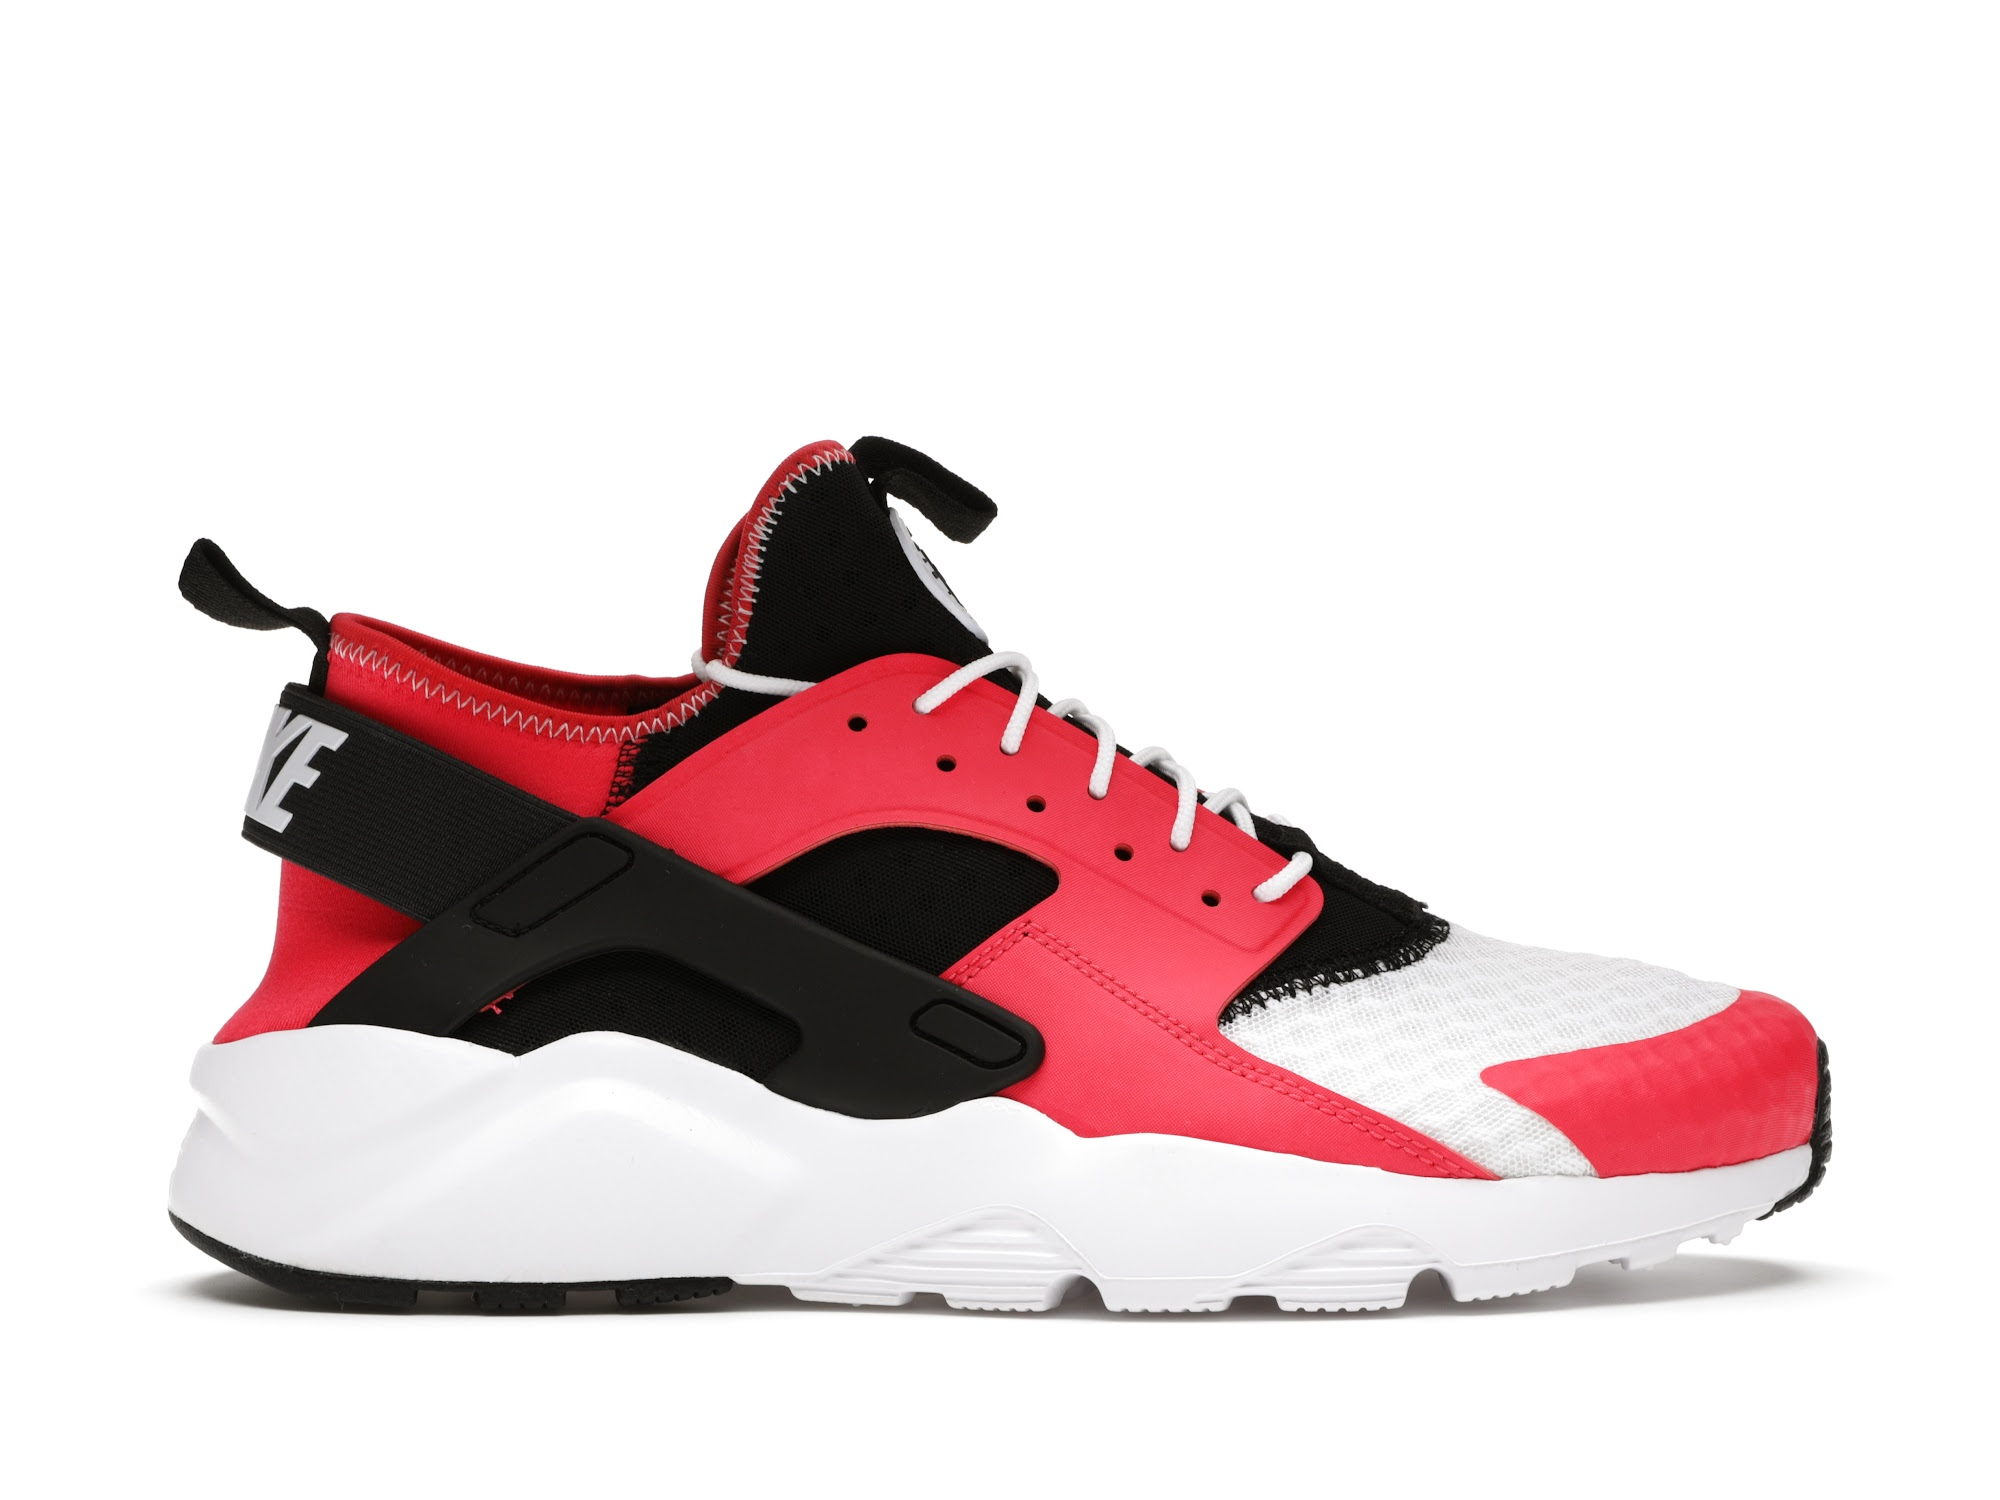 Nike Air Huarache Run Ultra Siren Red